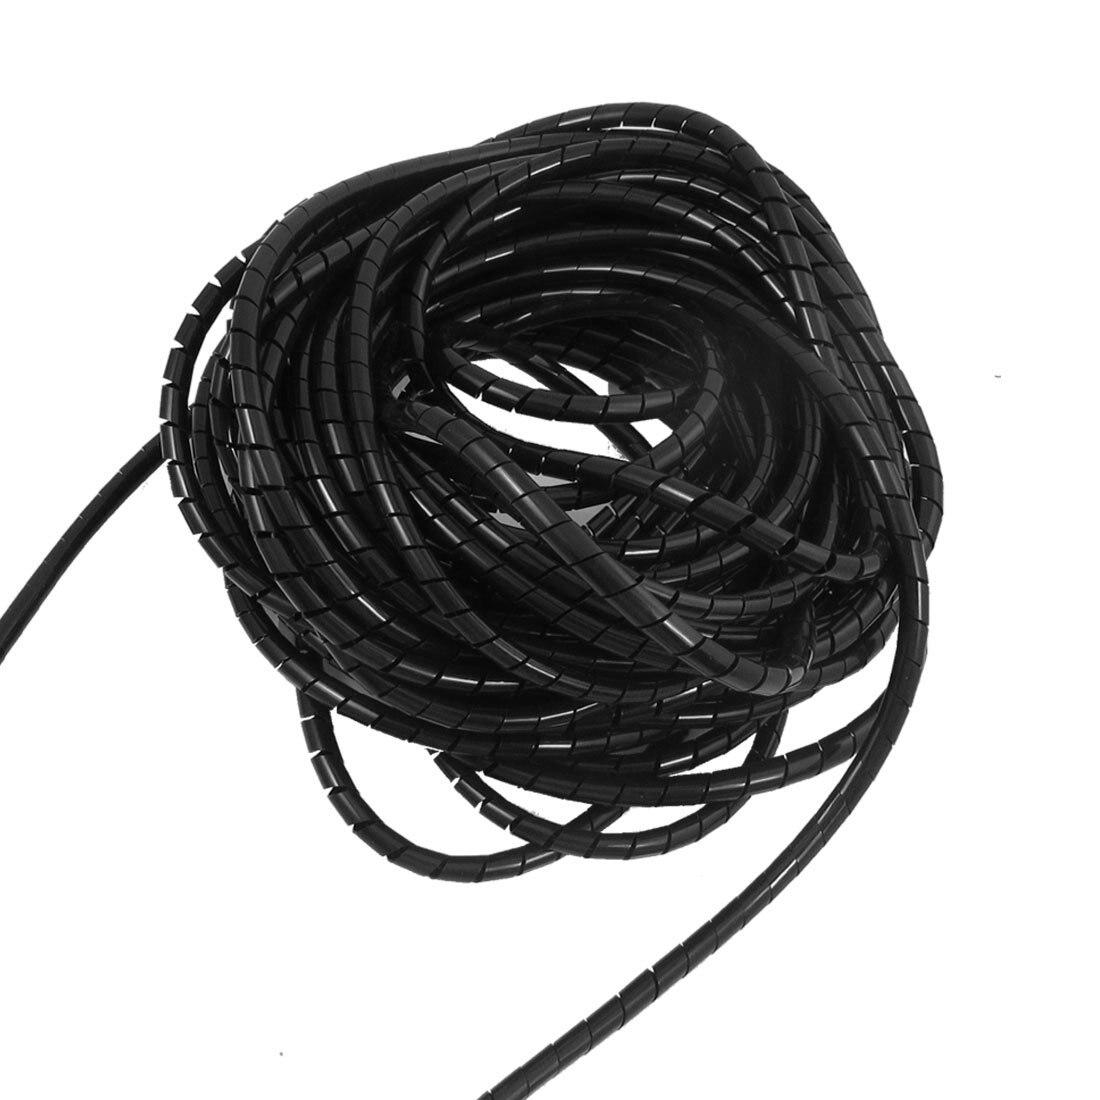 MYLB-6mm Dia exterior de 6,4 M Cable de polietileno en espiral PE envoltura de Cable de Tubo negro